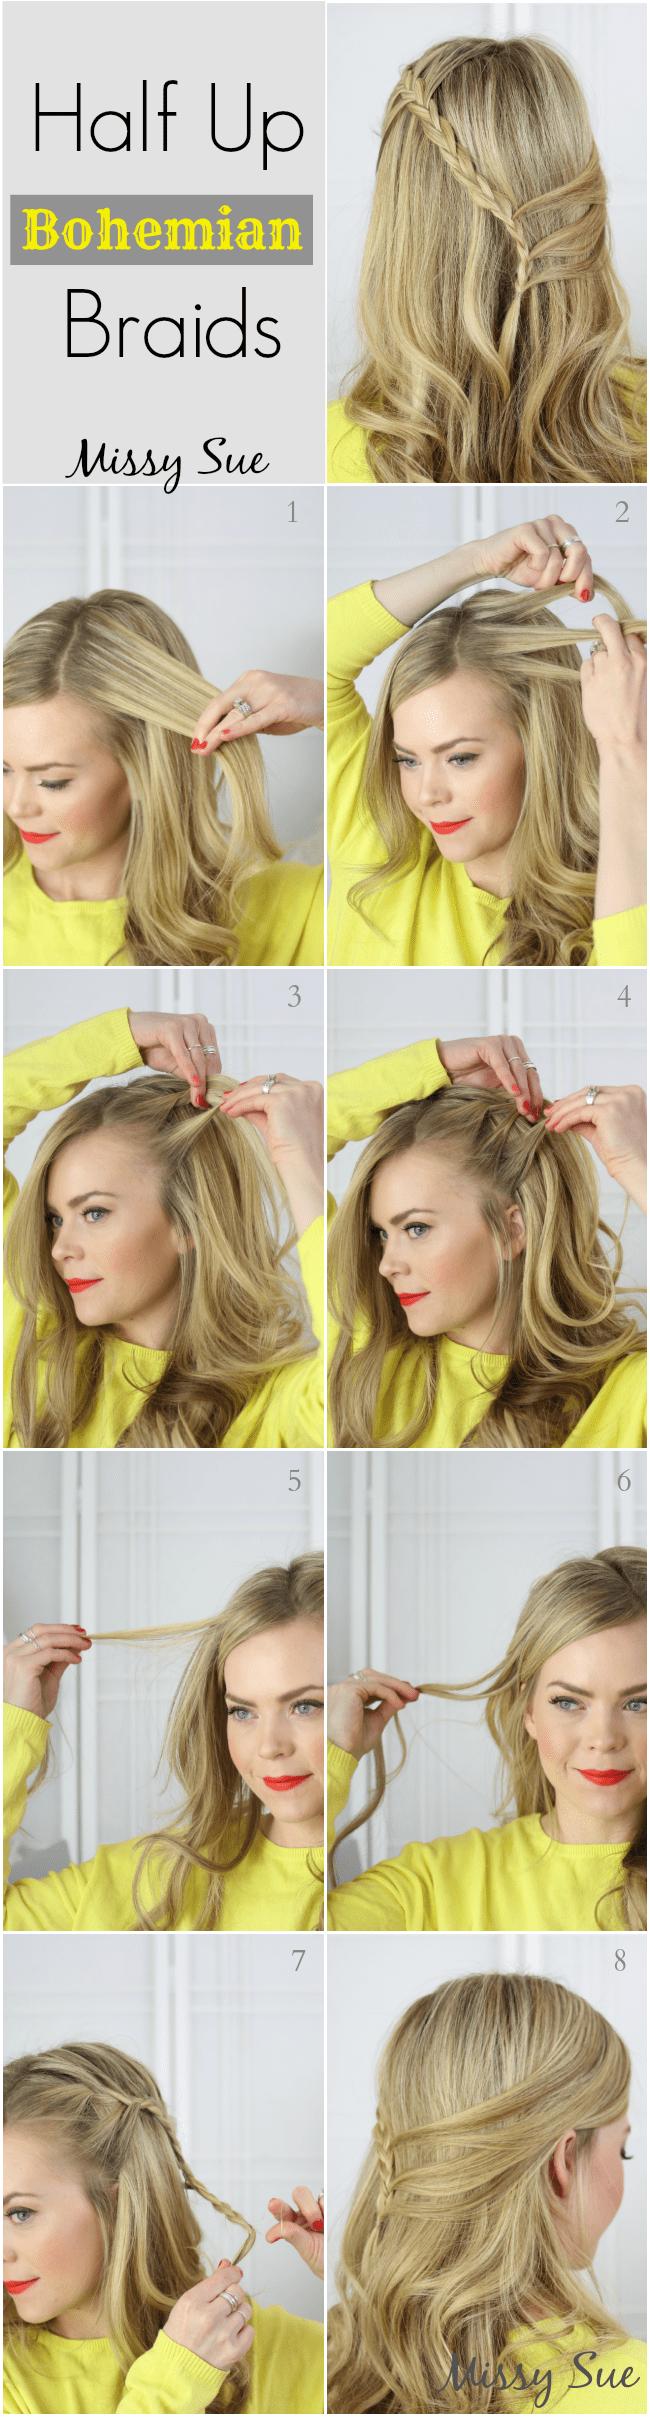 half-up-bohemian-braids-tutorial-missysue-blog